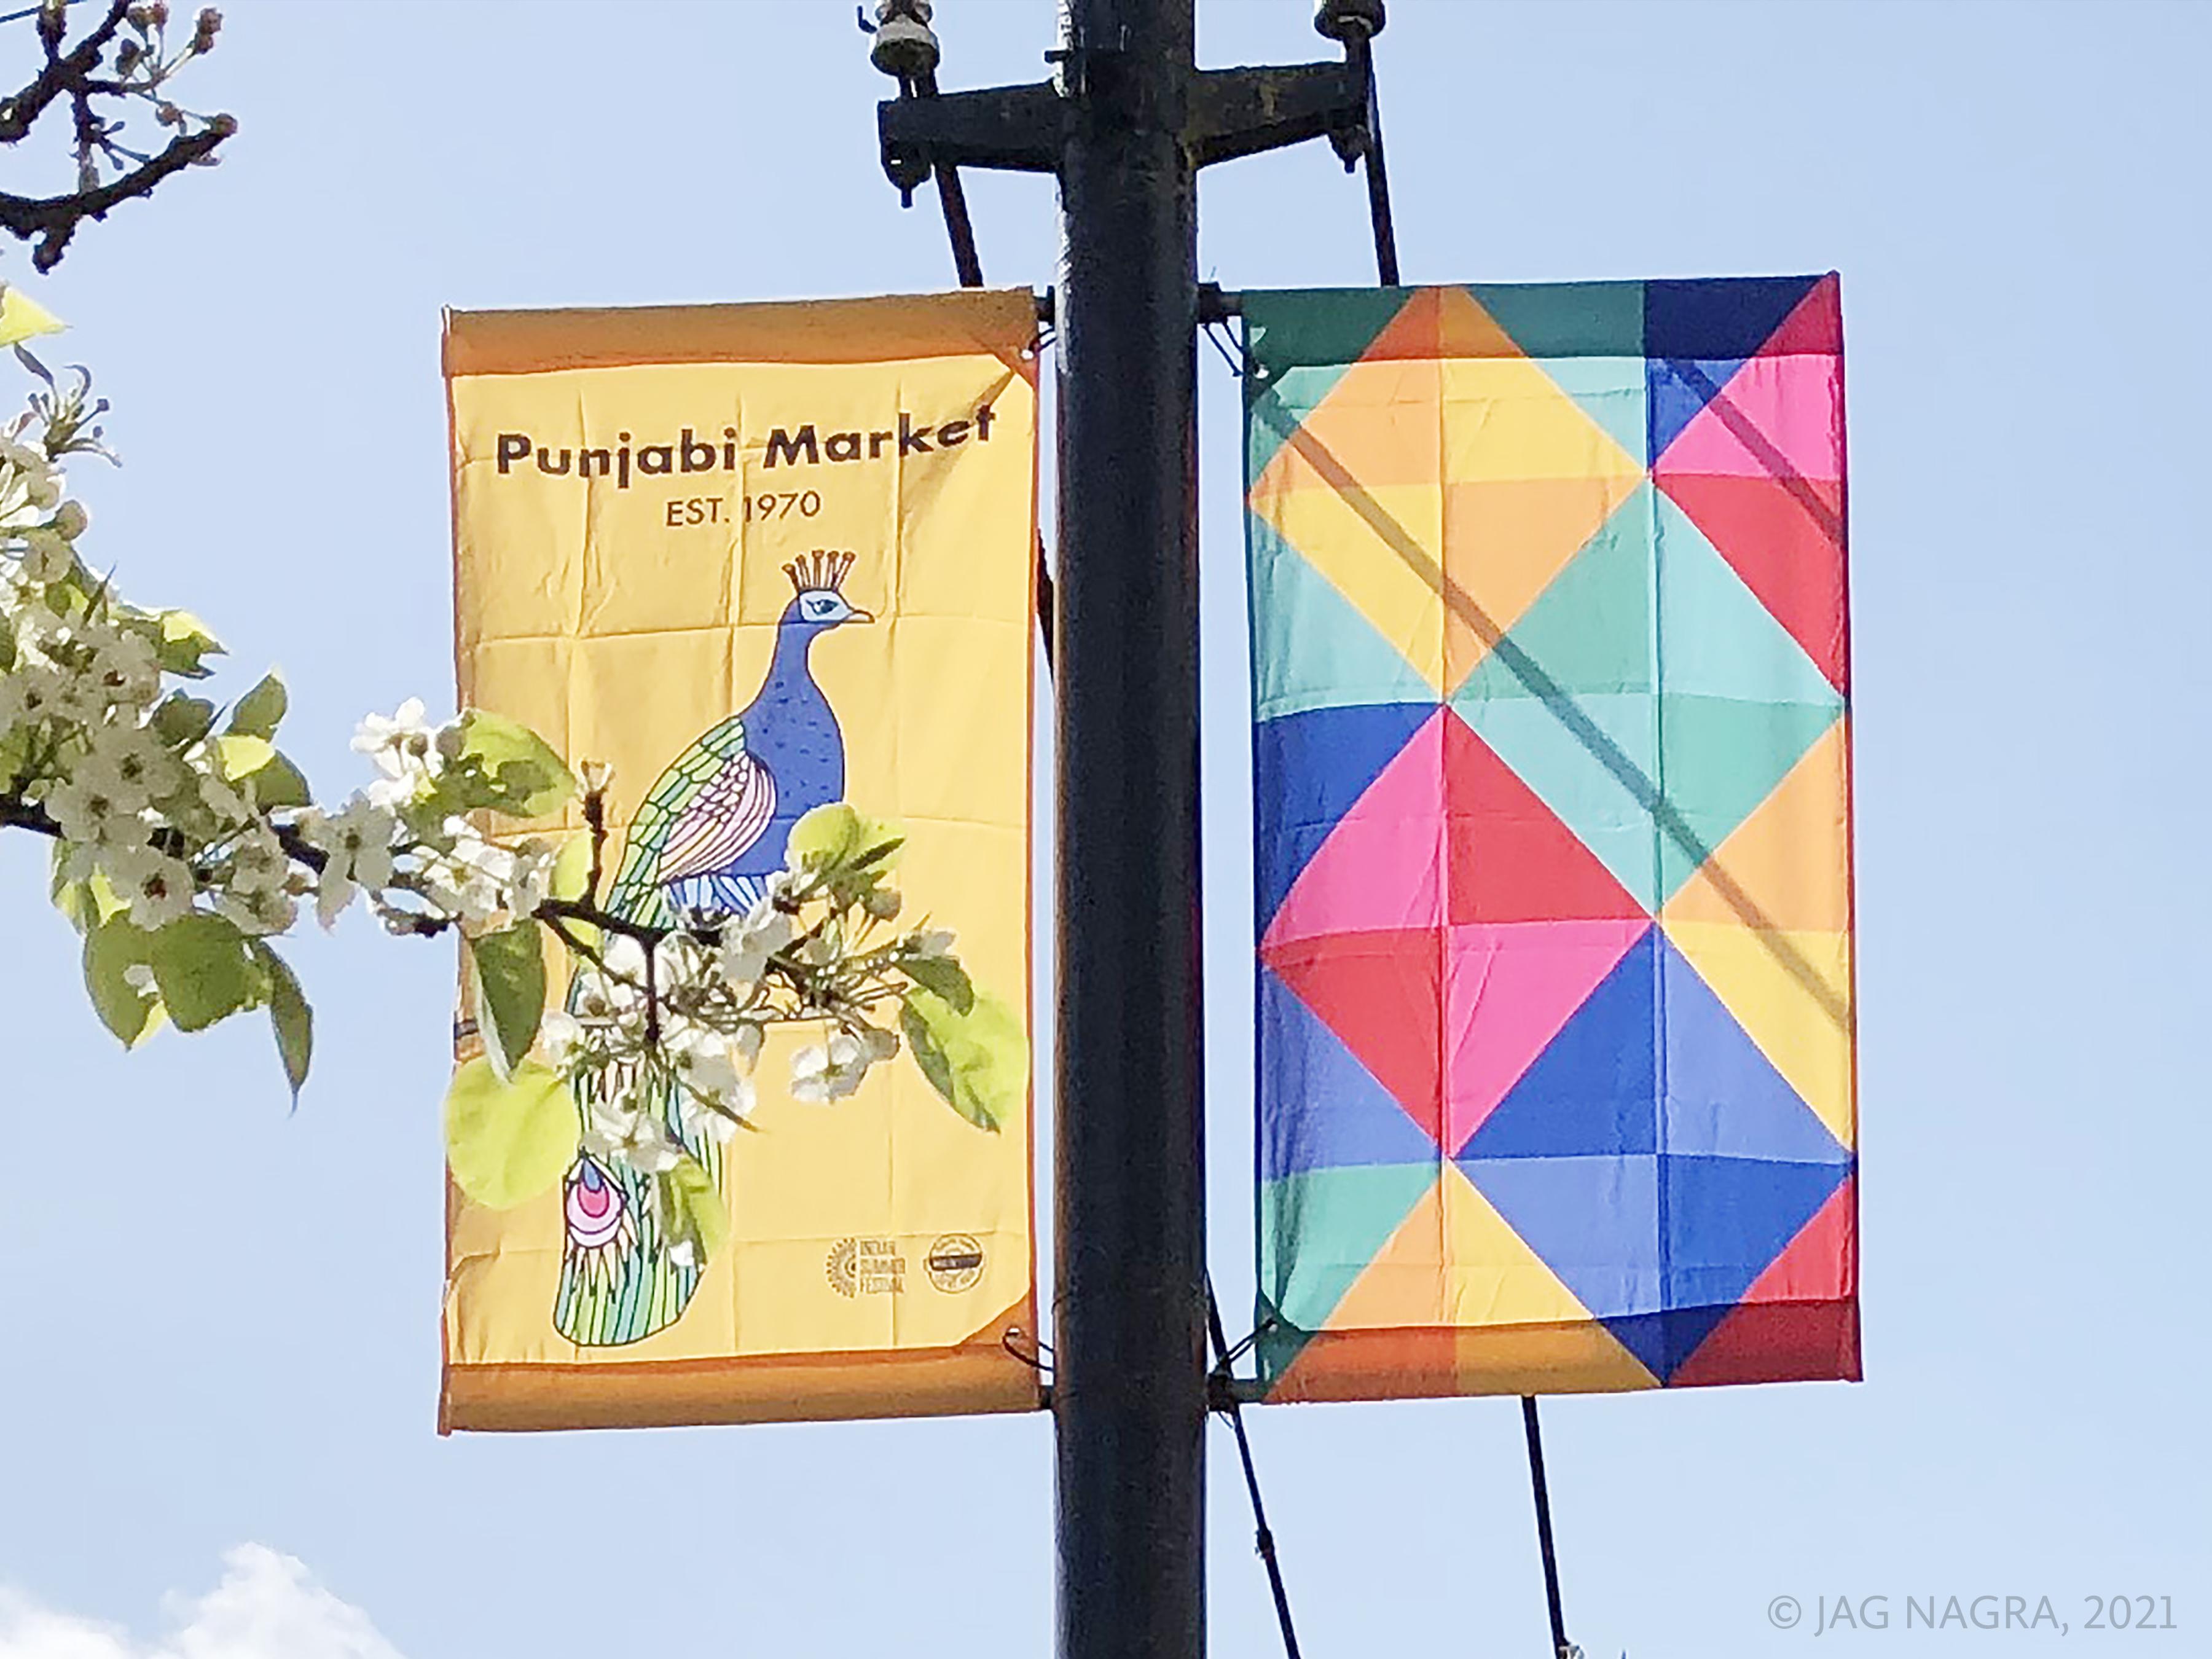 Banners_photo_credit_Jag_Nagra_04.21.2021